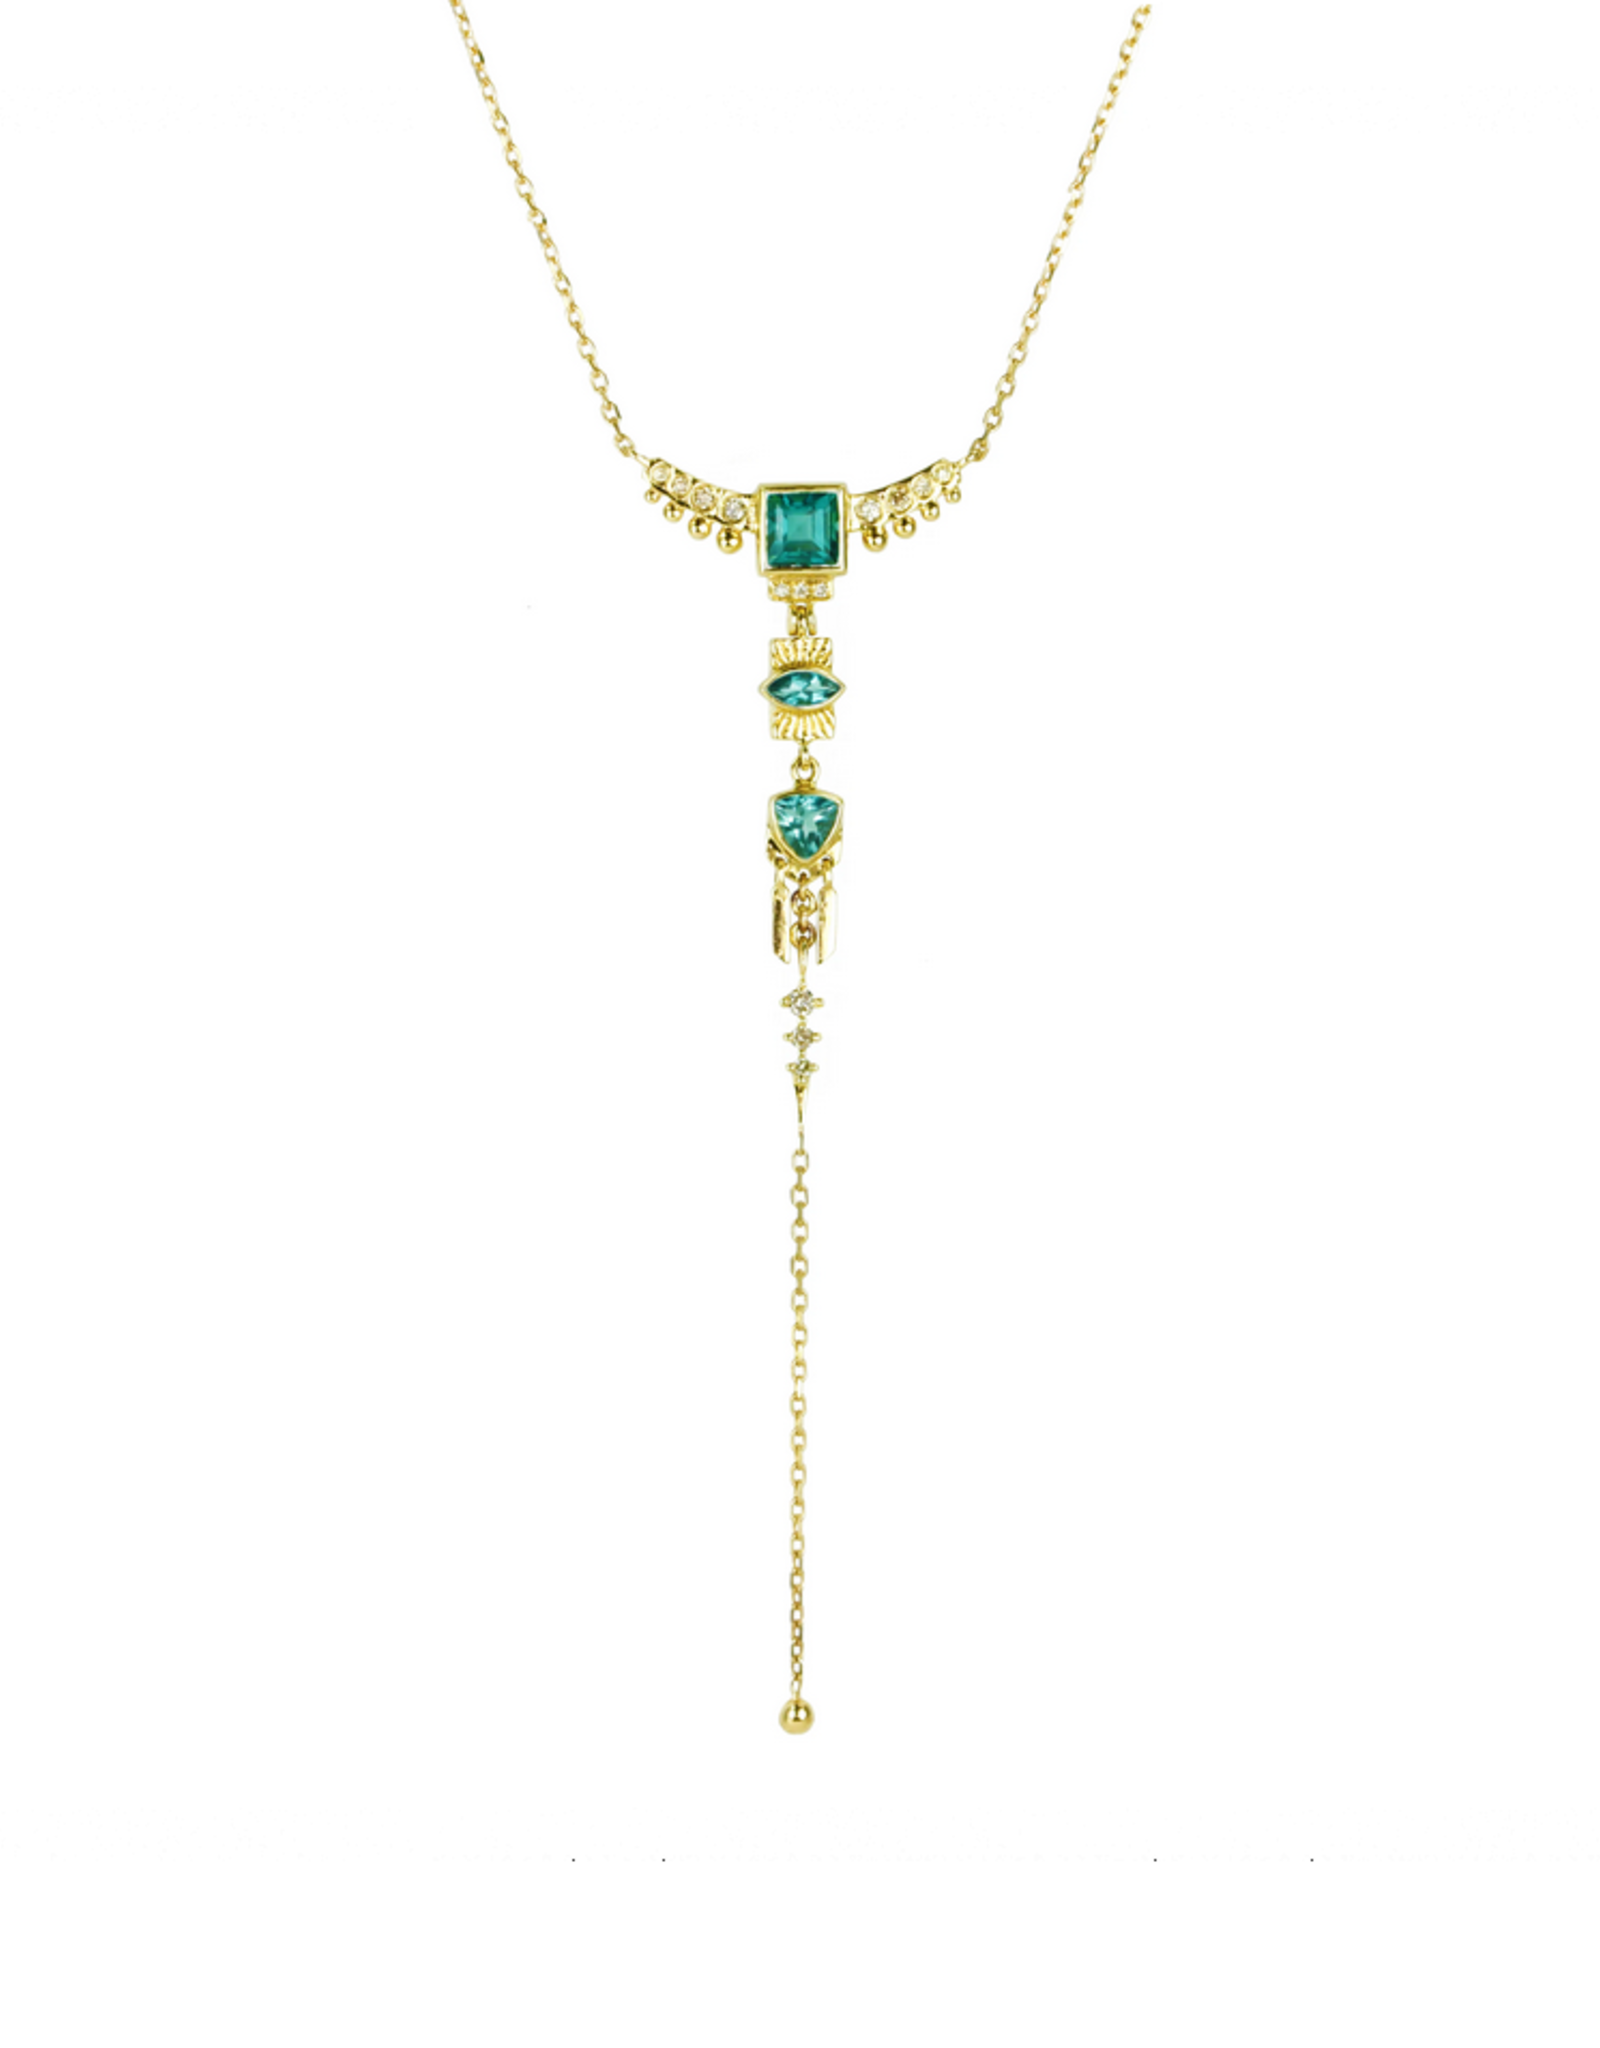 Celine Daoust Totem Lariat Necklace - Green Tourmaline + Diamonds